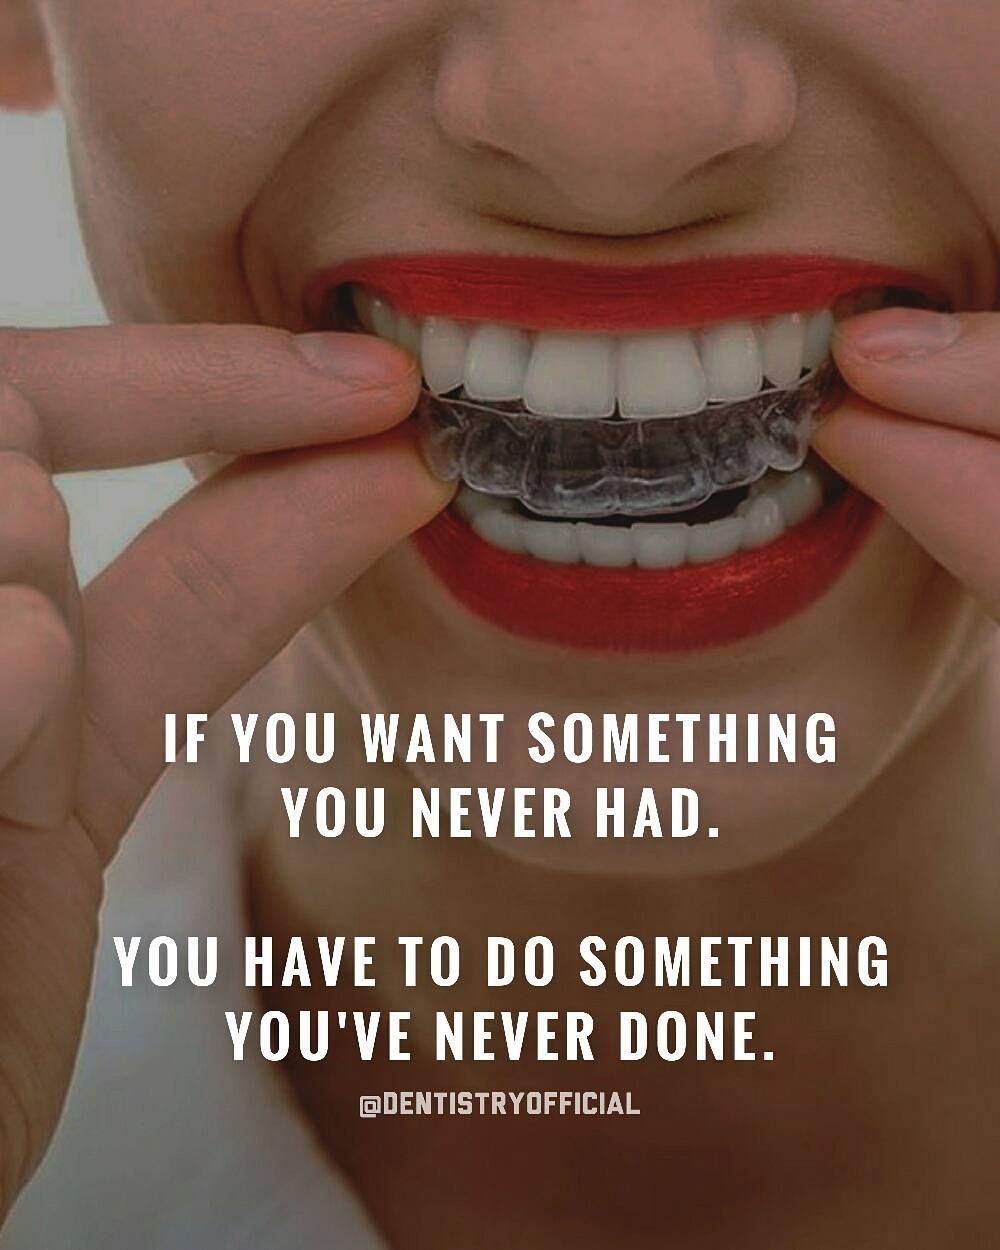 Dental Assistant Jobs Near Me Dental assistant jobs